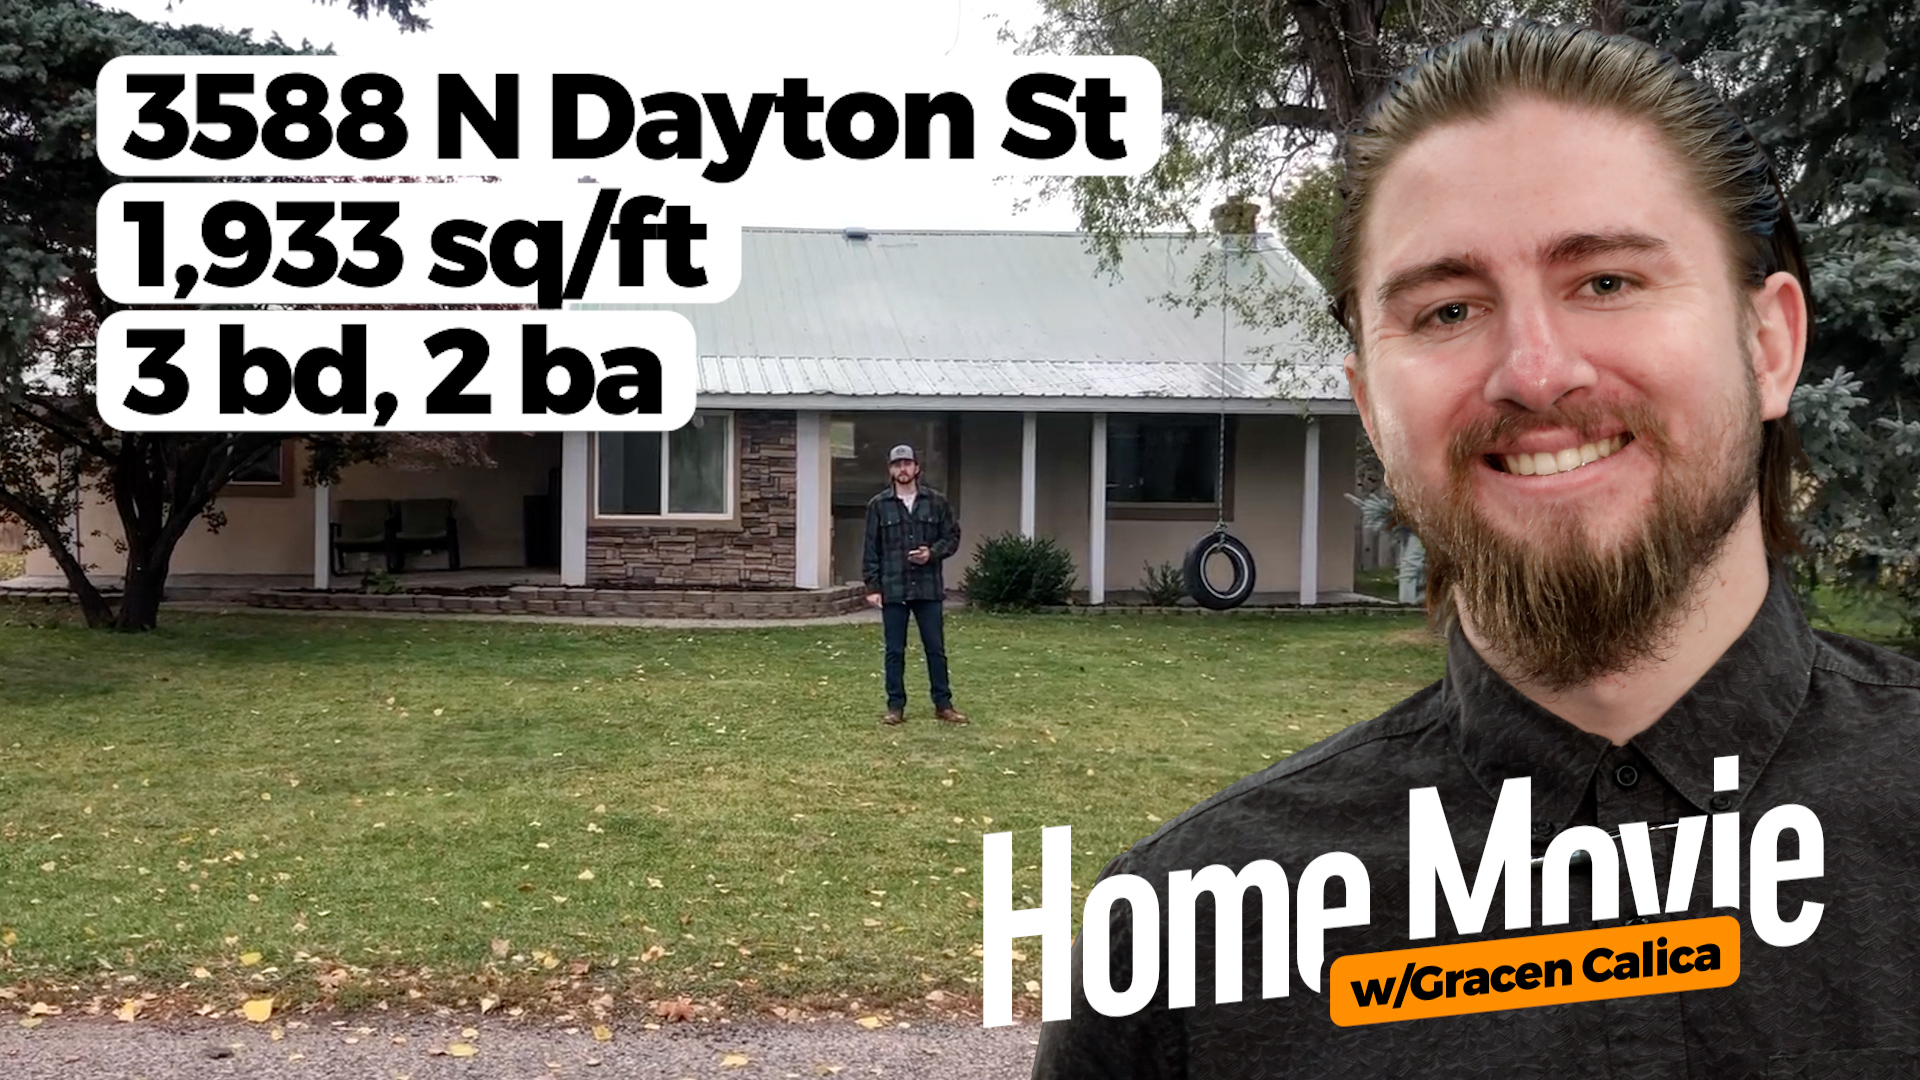 NEW TO THE MARKET! 3588 N Dayton Street in Iona, Idaho!